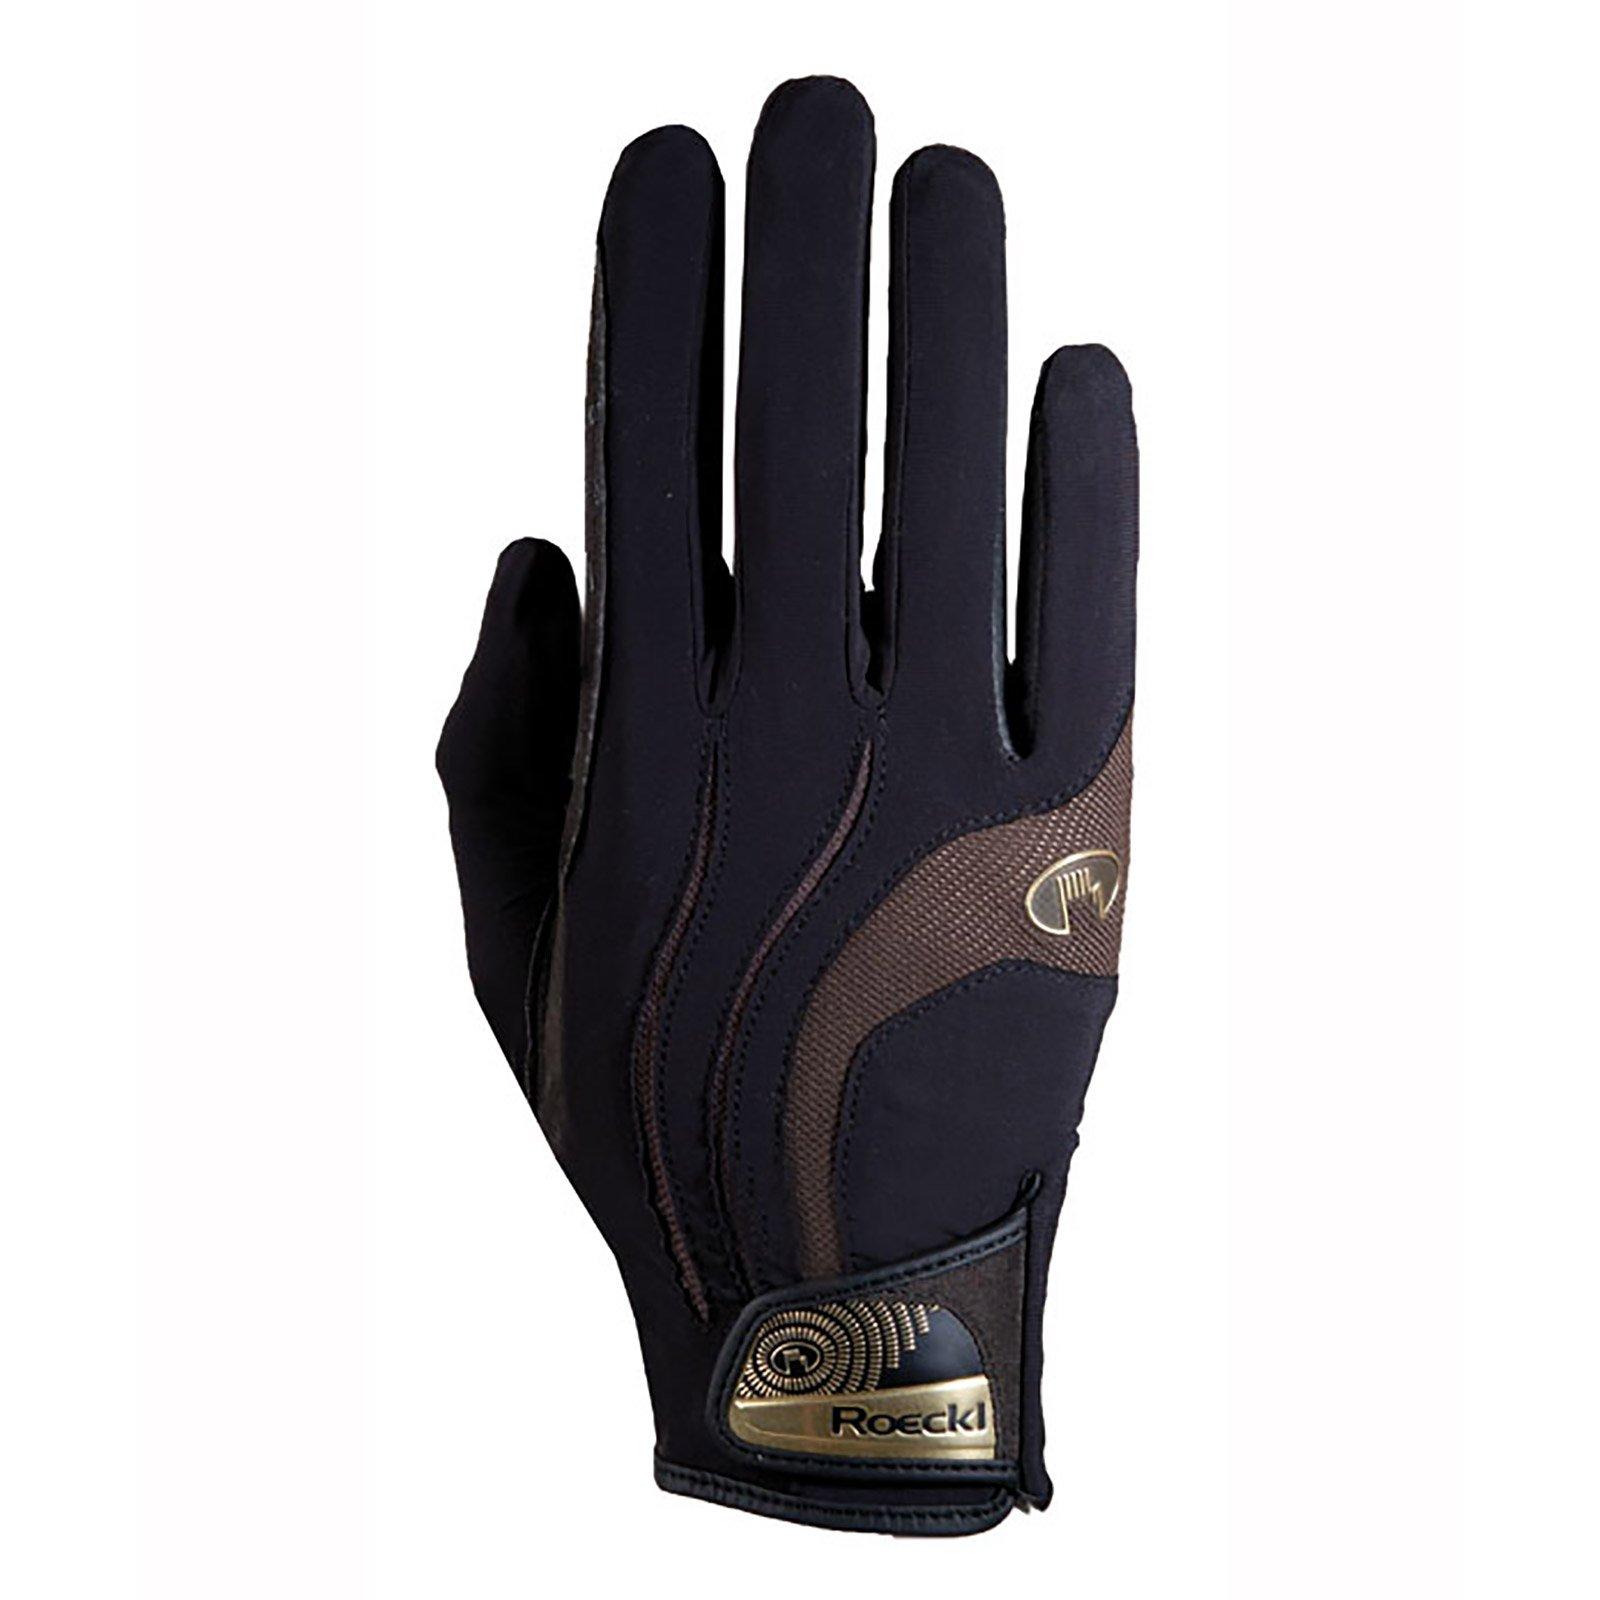 Roeckl Malia Riding Gloves Black/Mocha 8